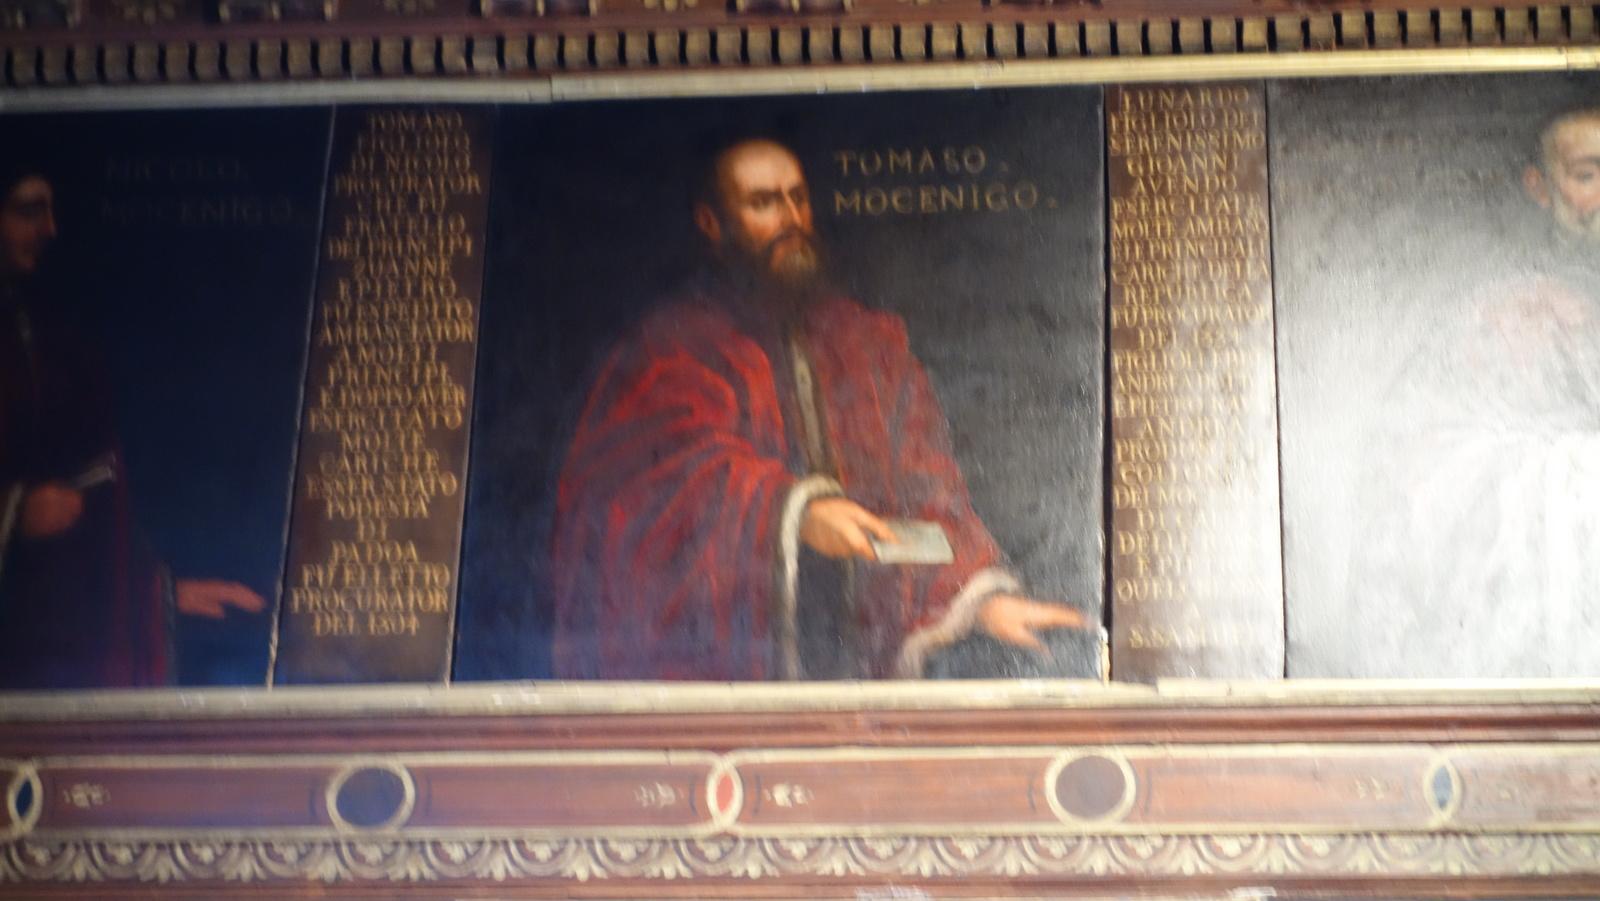 039 - Palazzo Mocenigo